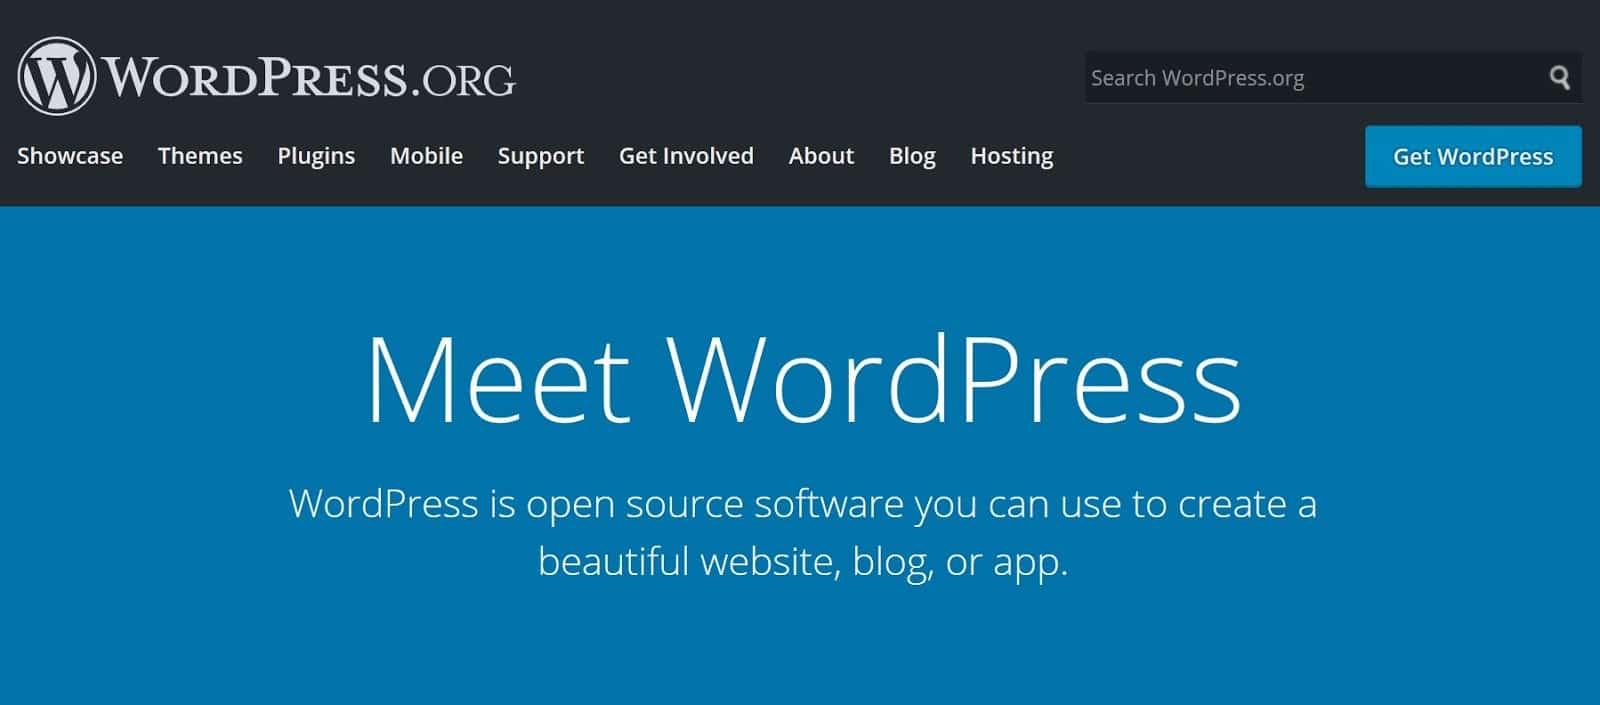 cms software 1 wordpress